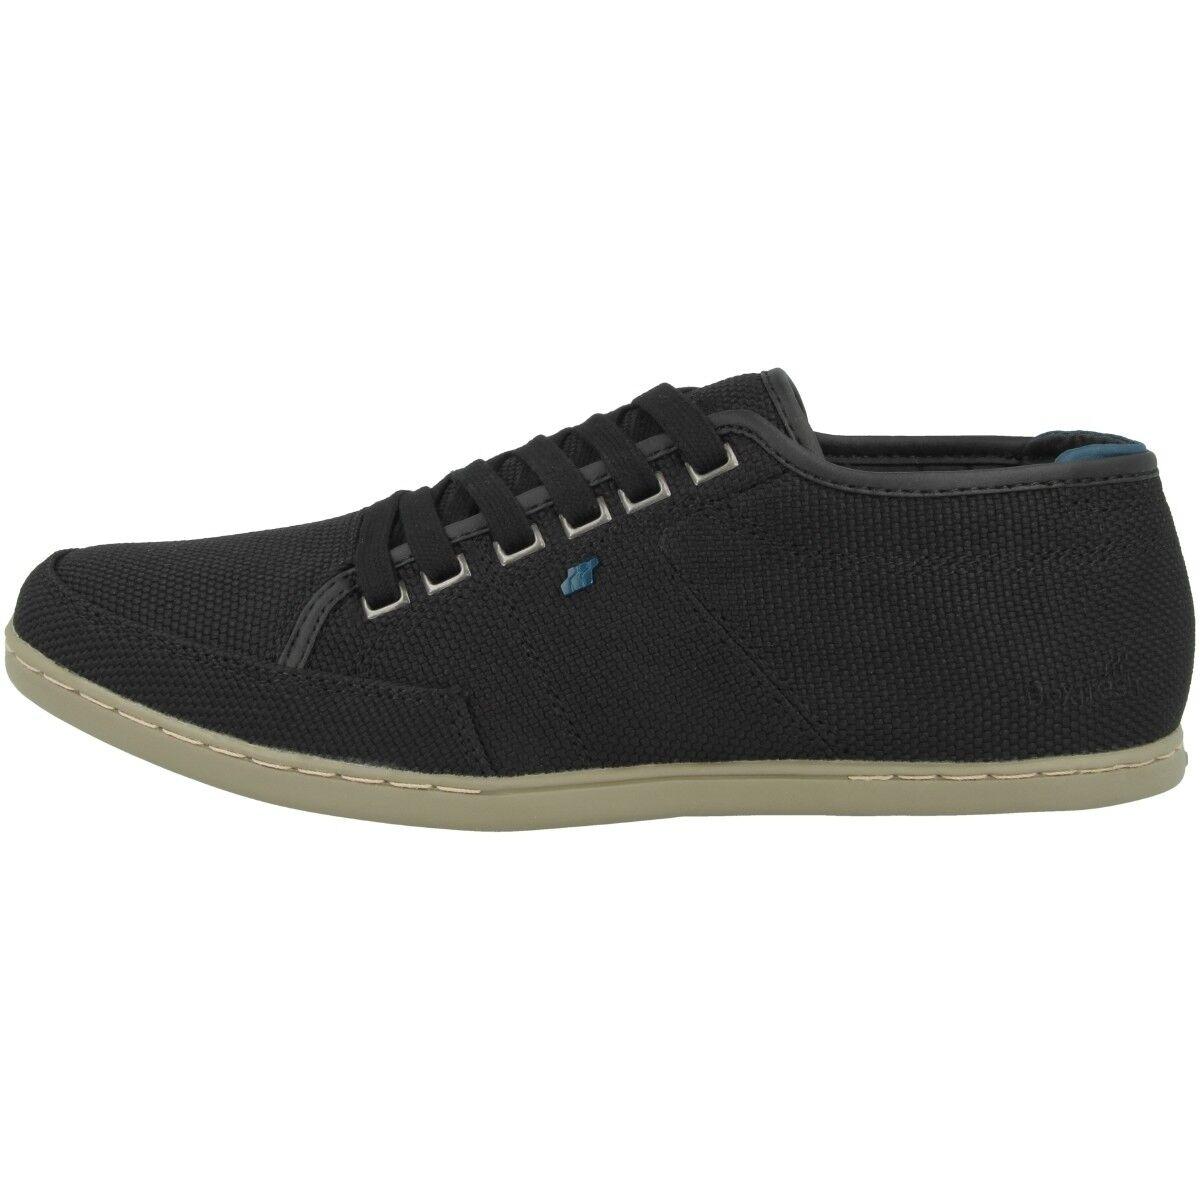 Zapatos promocionales para hombres y mujeres Boxfresh Sparko SH Ballistic Nylon Schuhe Herren Sports Hybrid Sneaker E15362